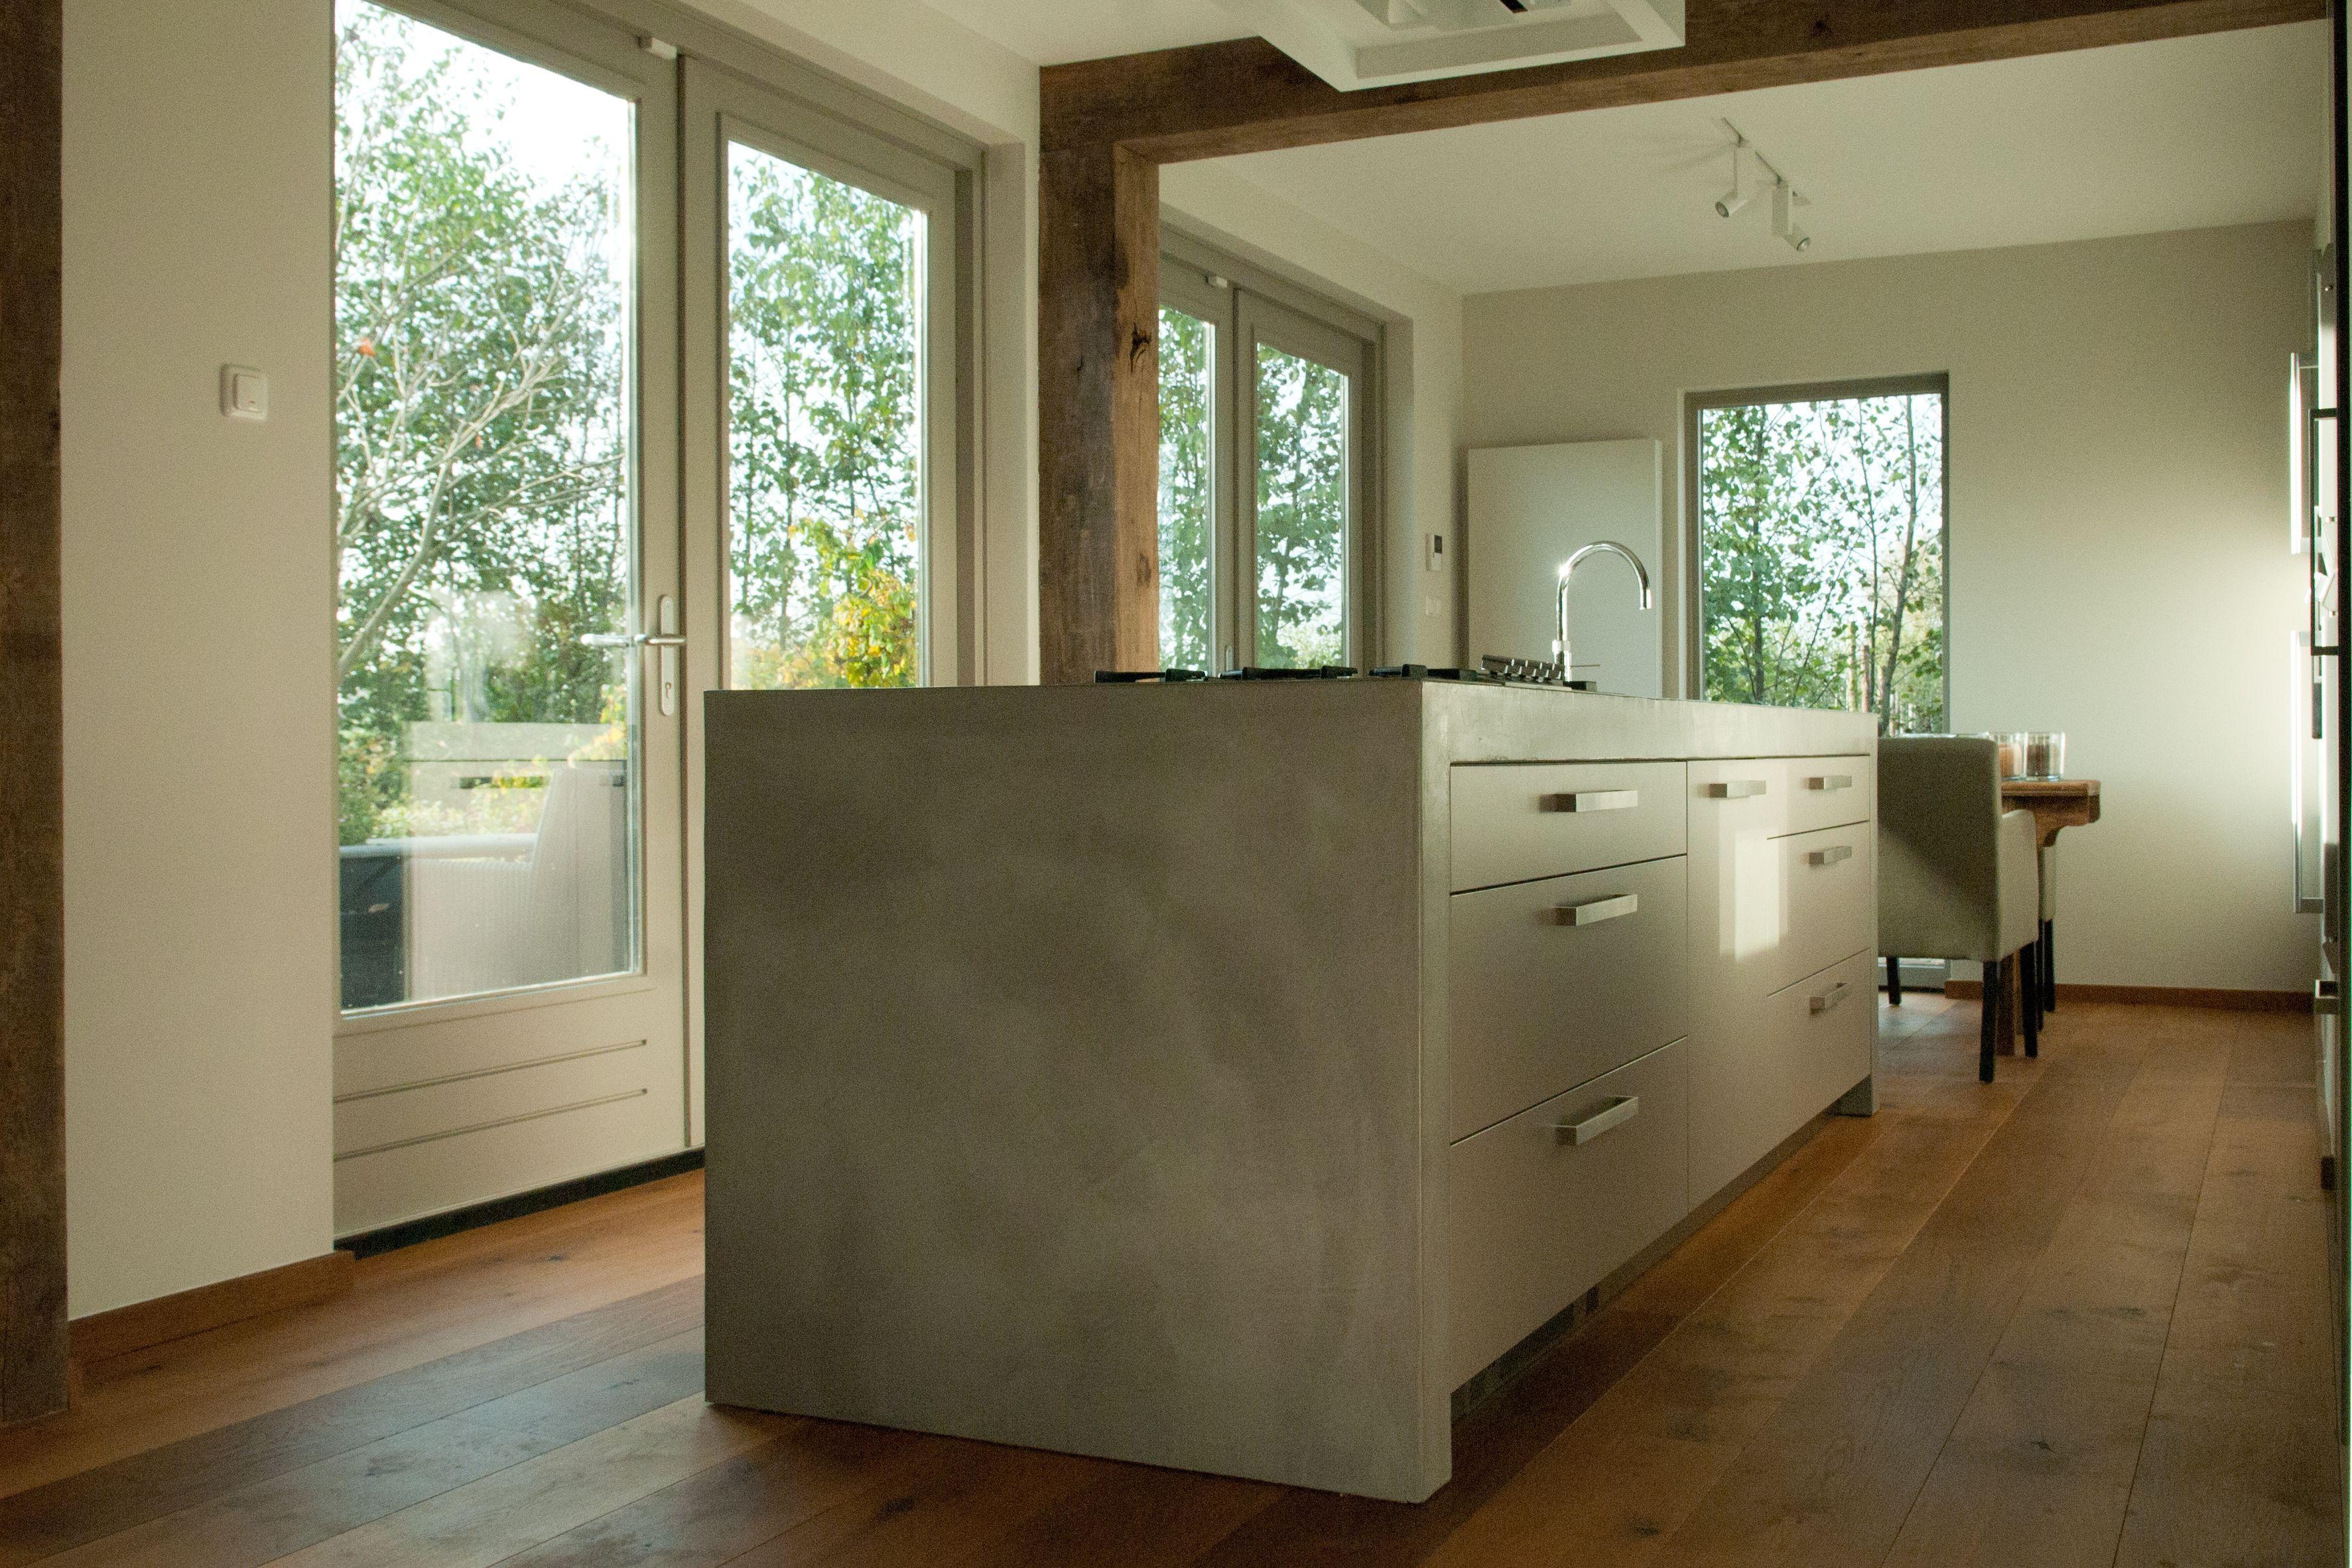 Keukenmeubel verbau betonstuc kleur #02 ijzererts. in samenwerking